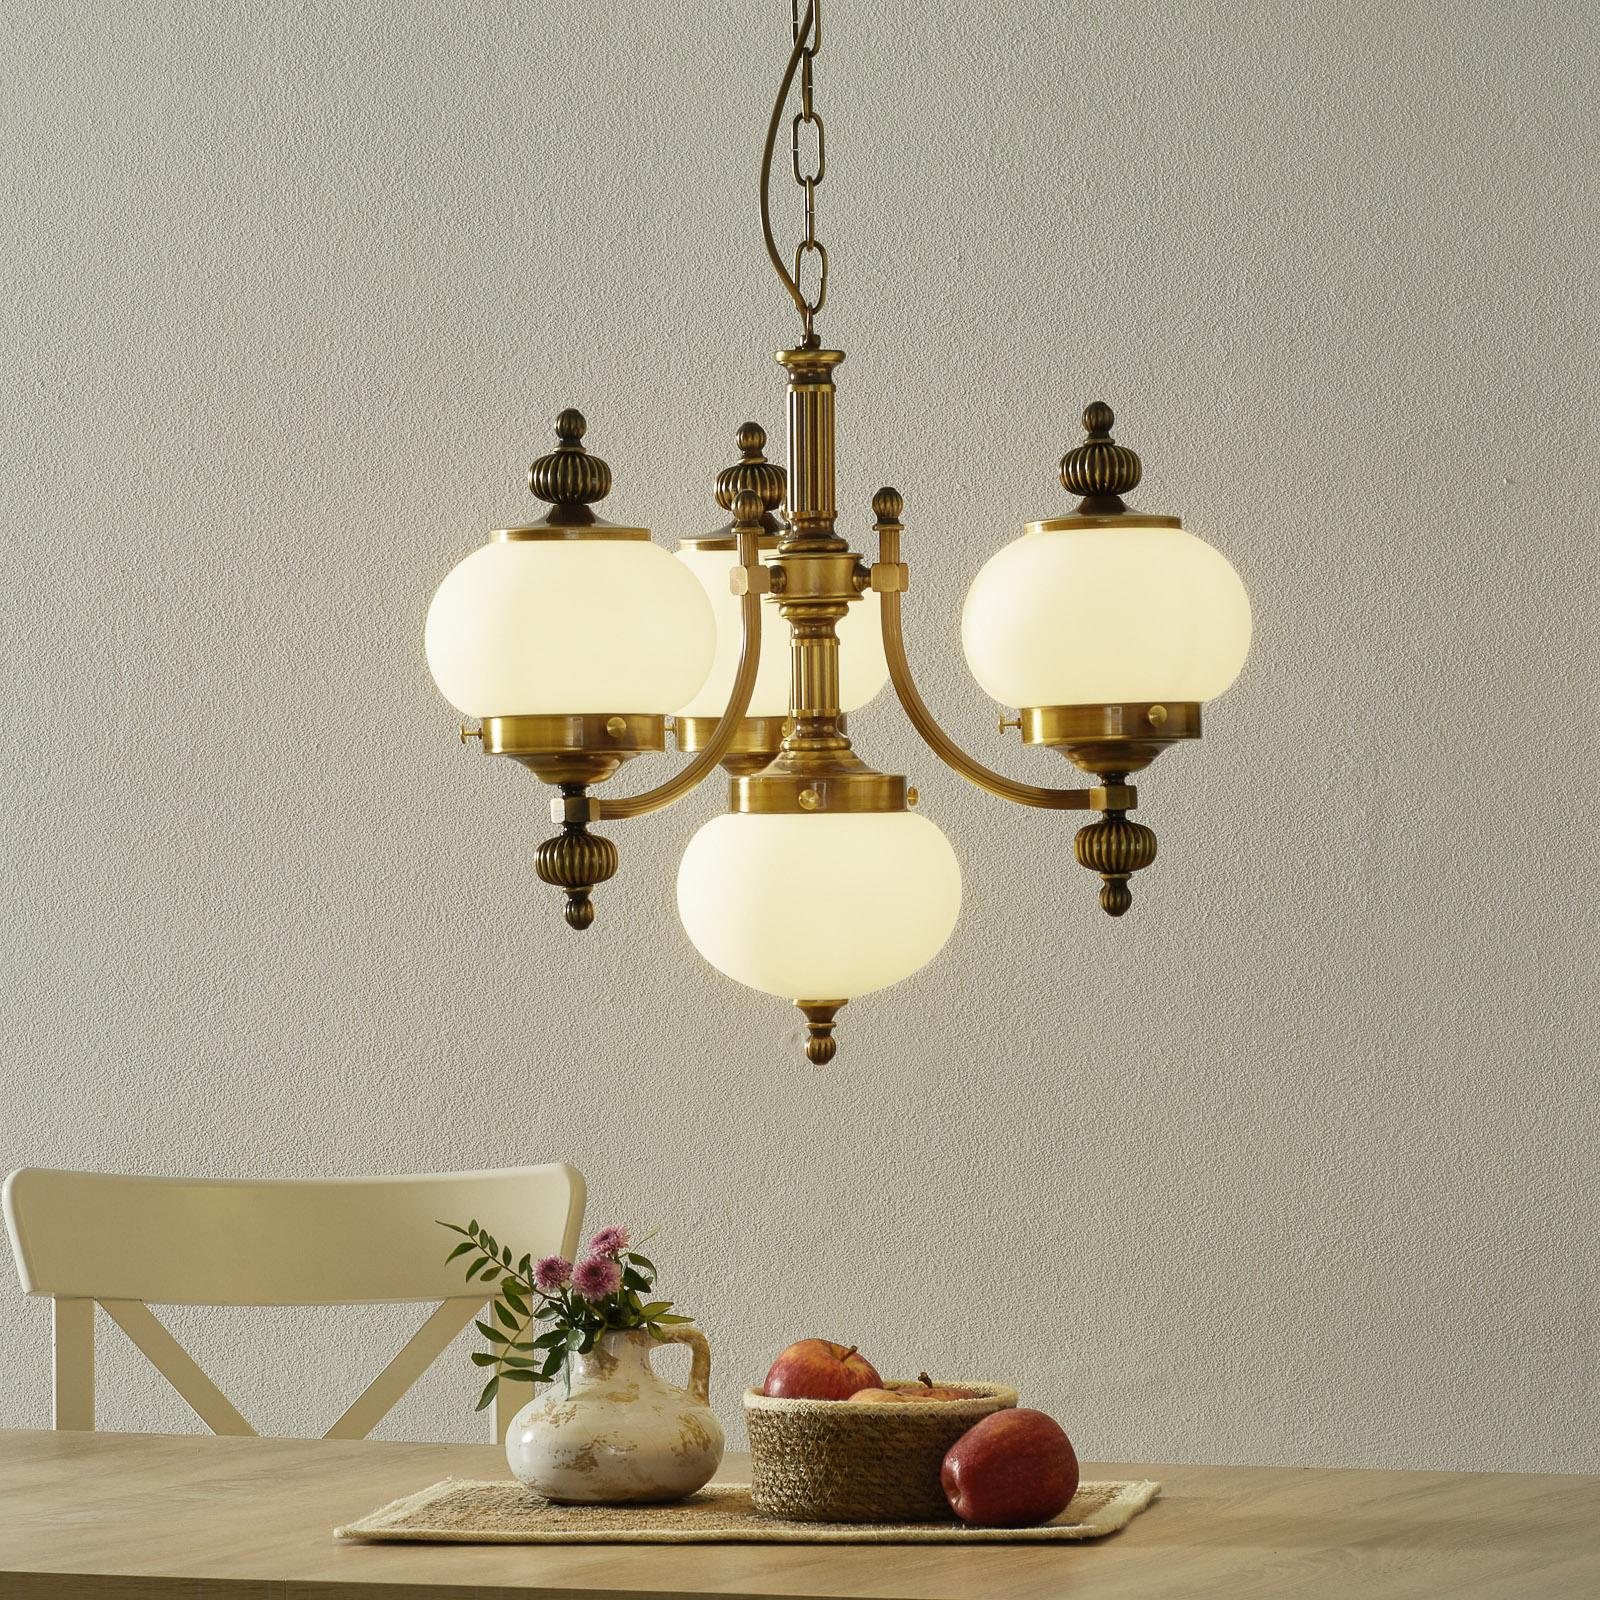 Hanglamp Delia in oud messing, 4-lamps